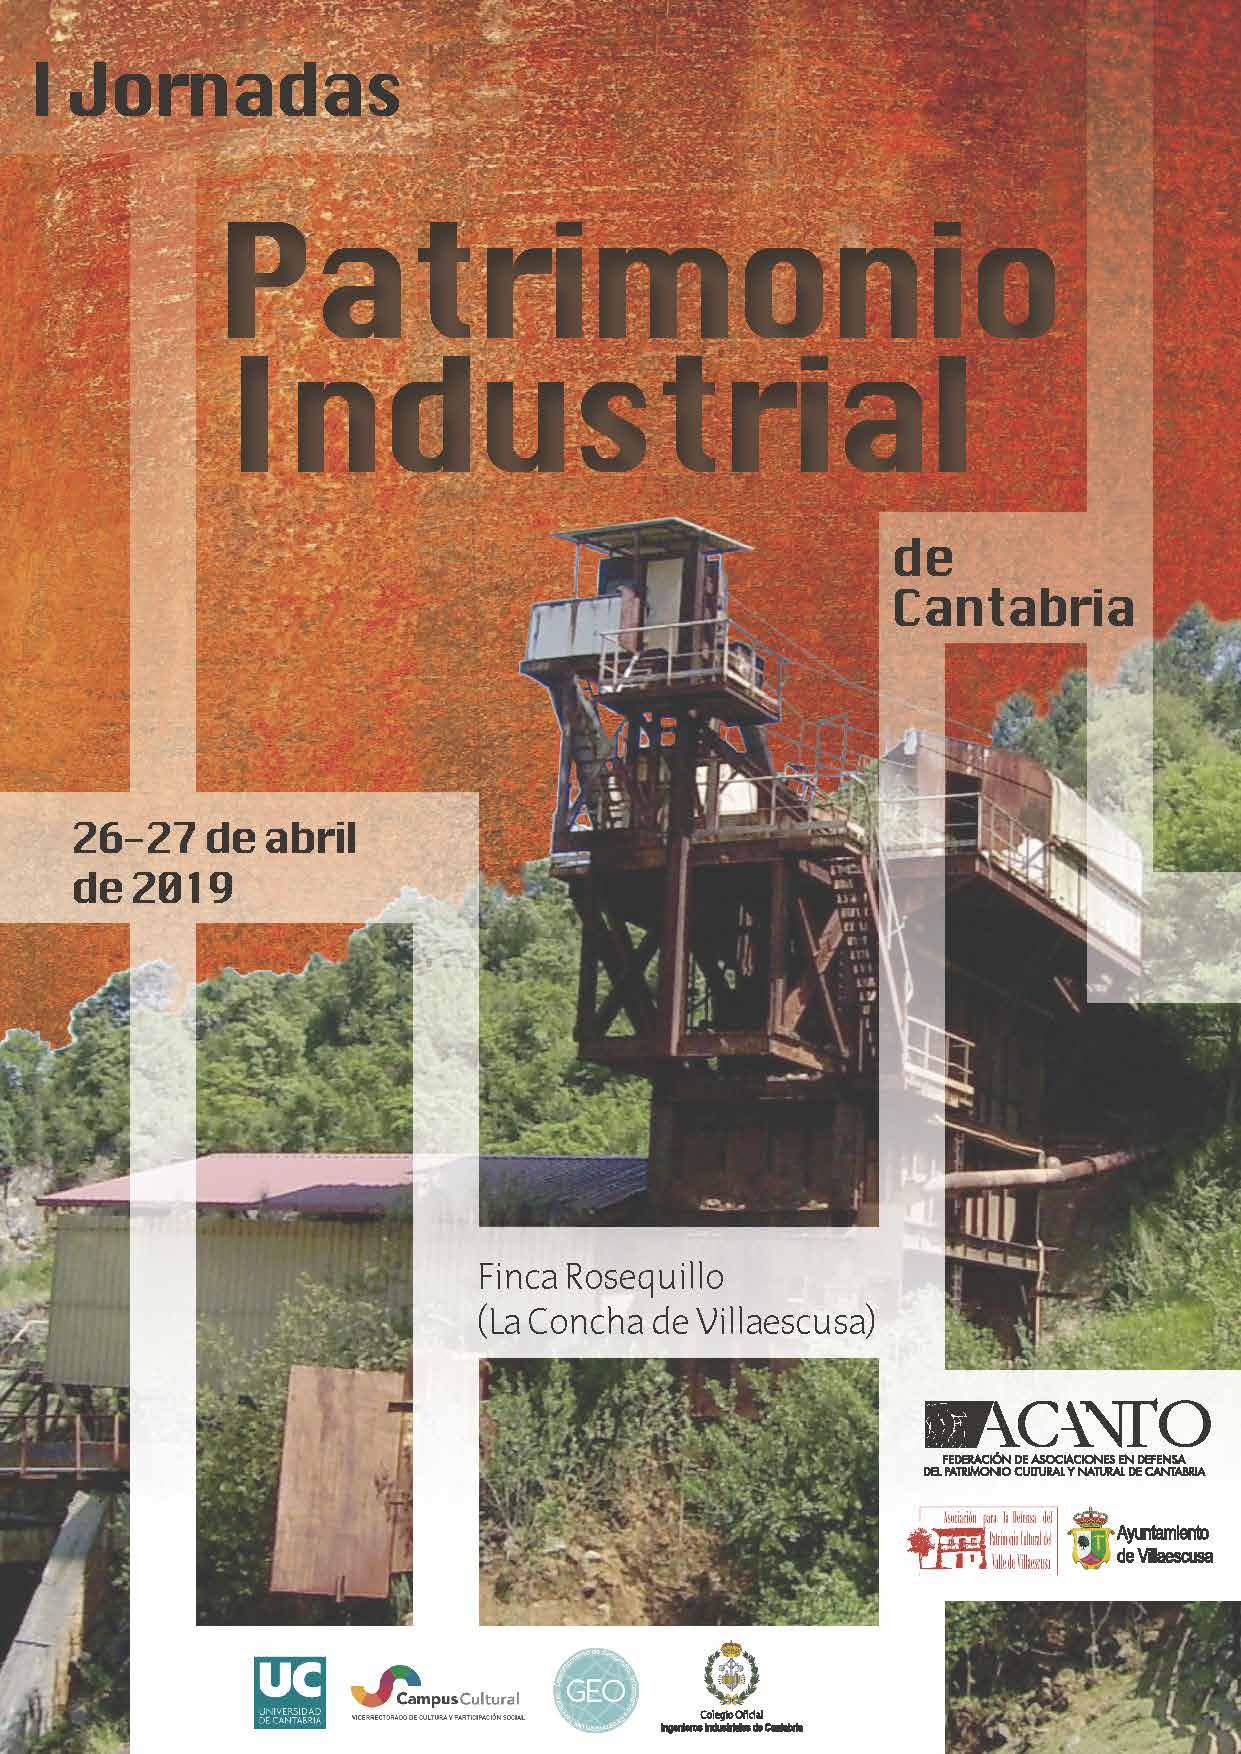 I Jornadas ACANTO sobre Patrimonio Industrial de Cantabria. Finca Rosequillo (La Concha de Villaescusa).  26-27 de abril de 2019.